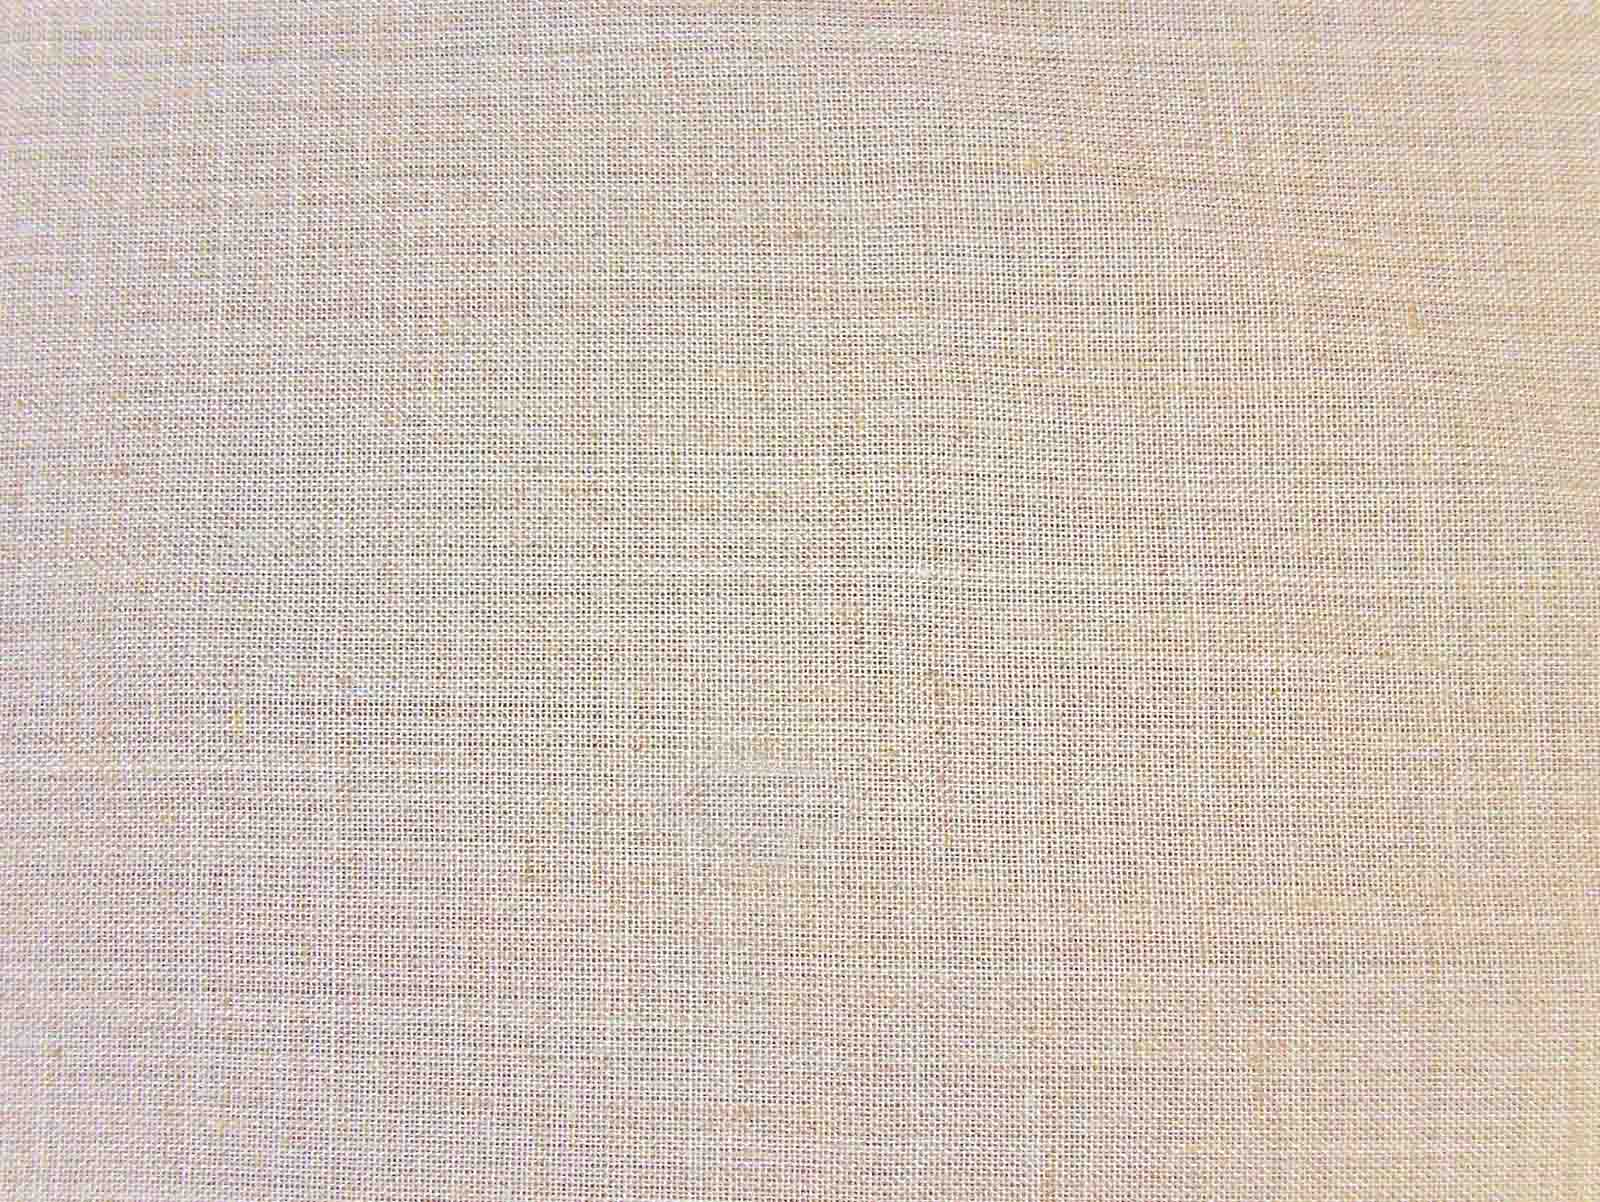 Texture-Linen by ttocsnodrog